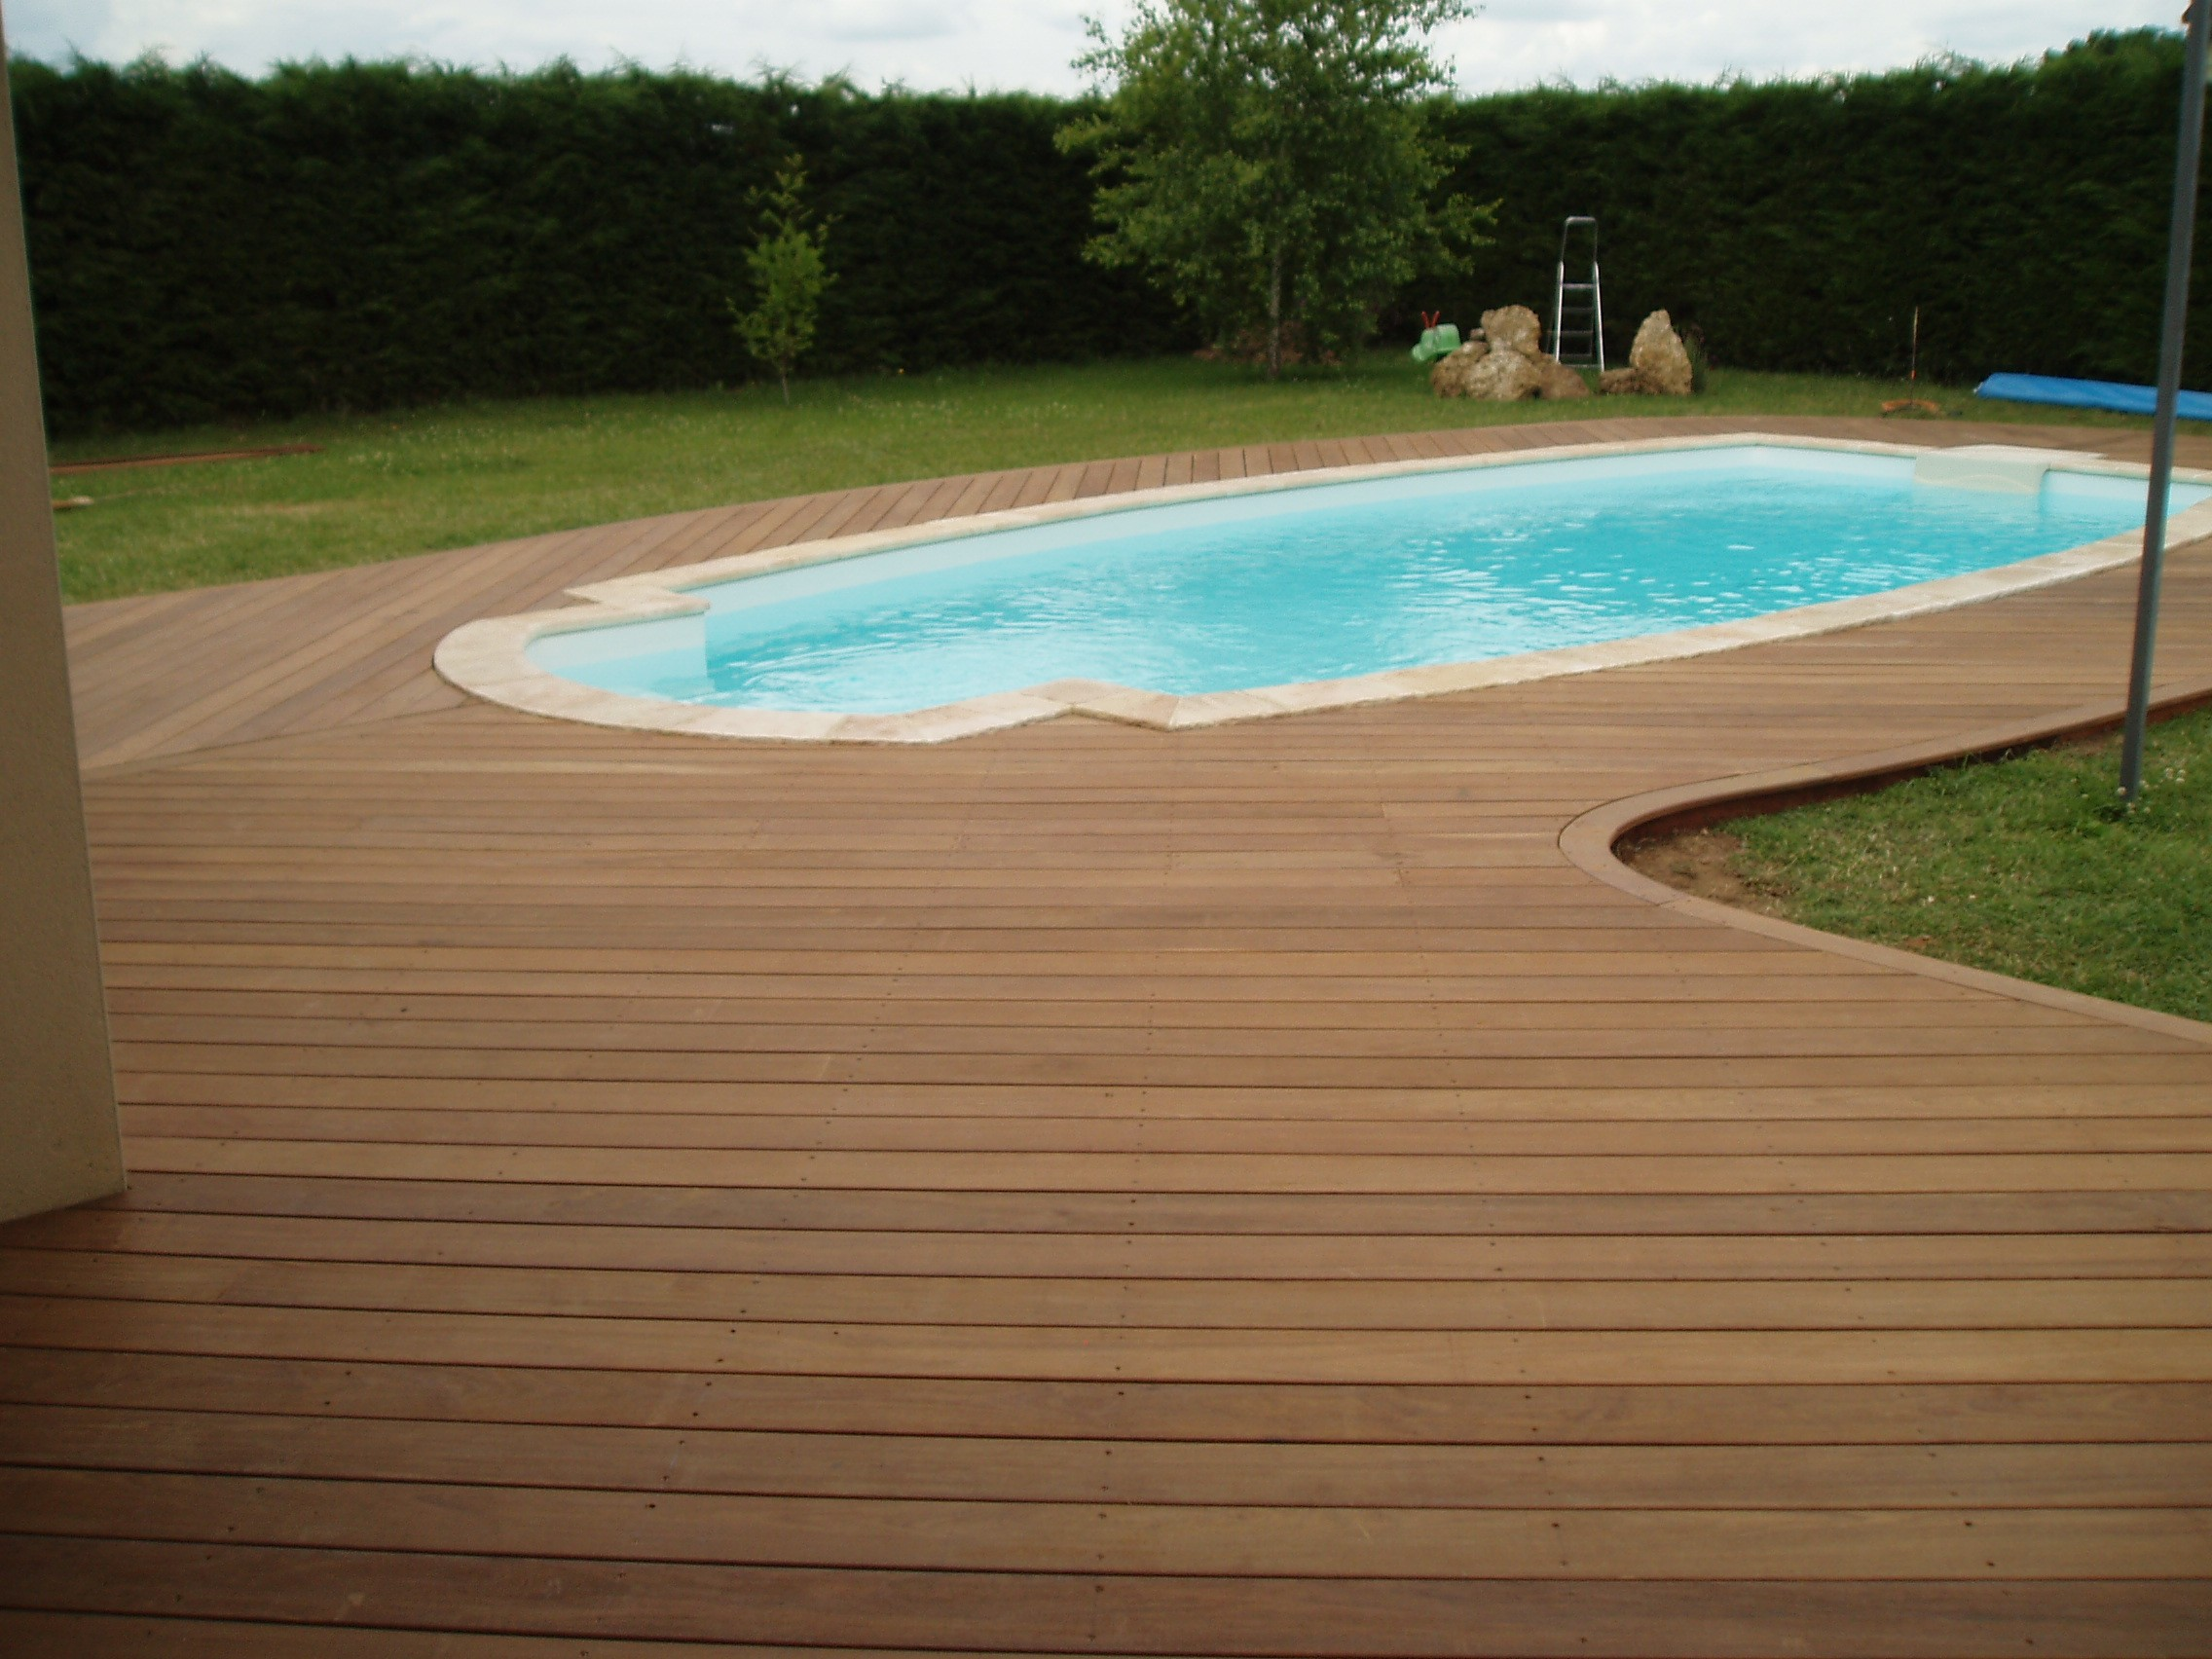 terrasse de piscine en bois quel